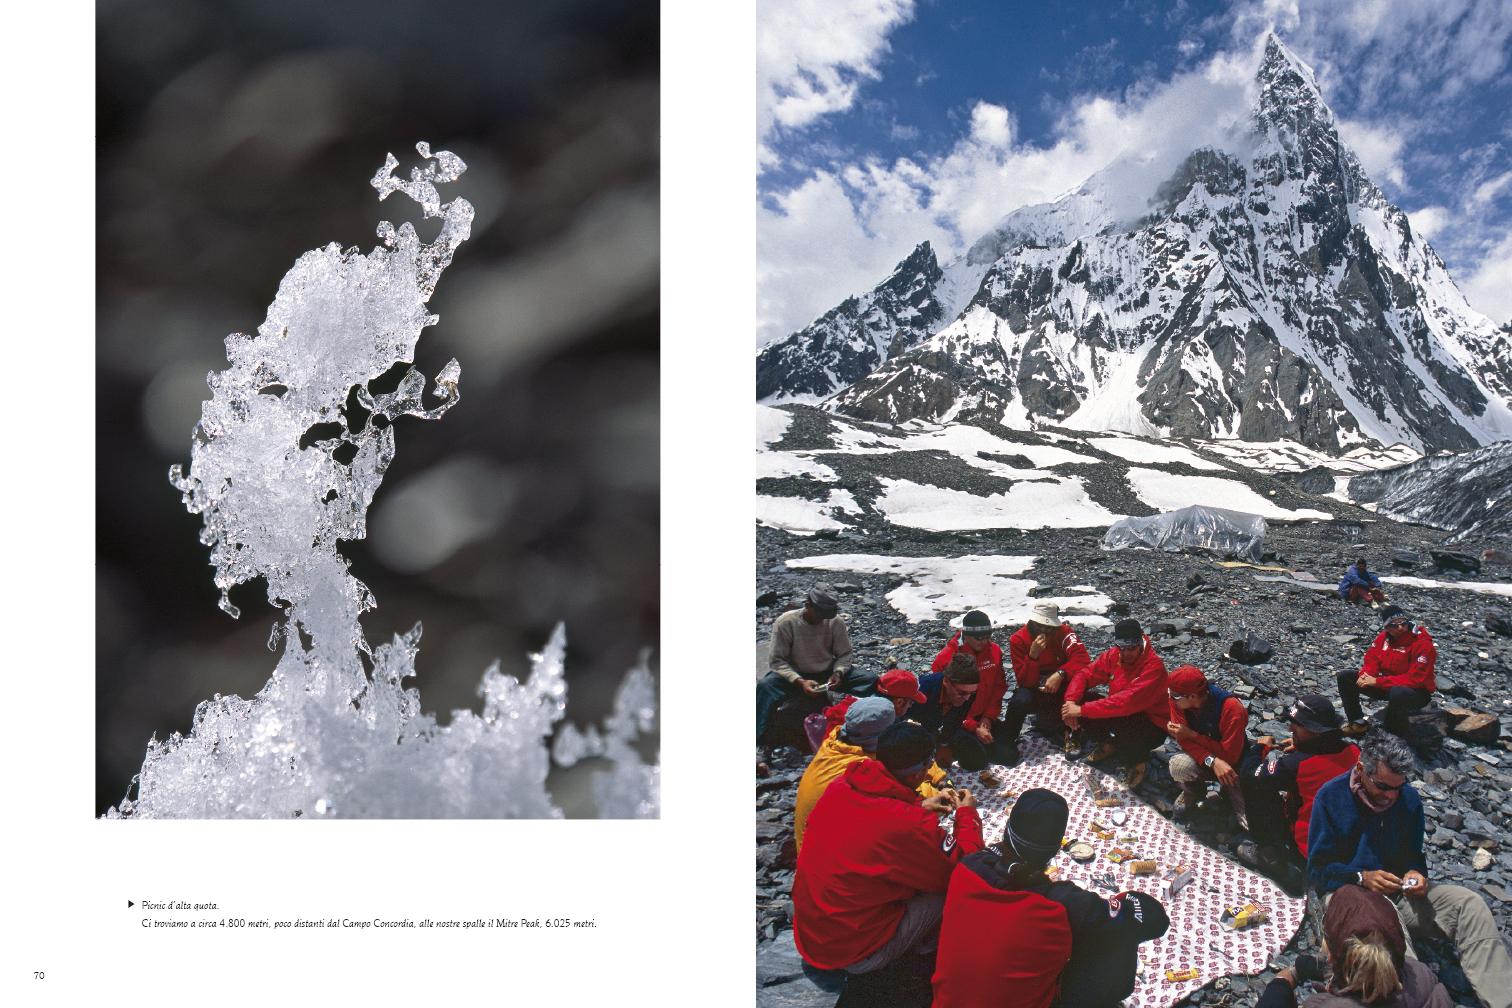 K2 EXPEDITION 1954-2004 Giuseppe Ghedina Fotografo - 037.jpg